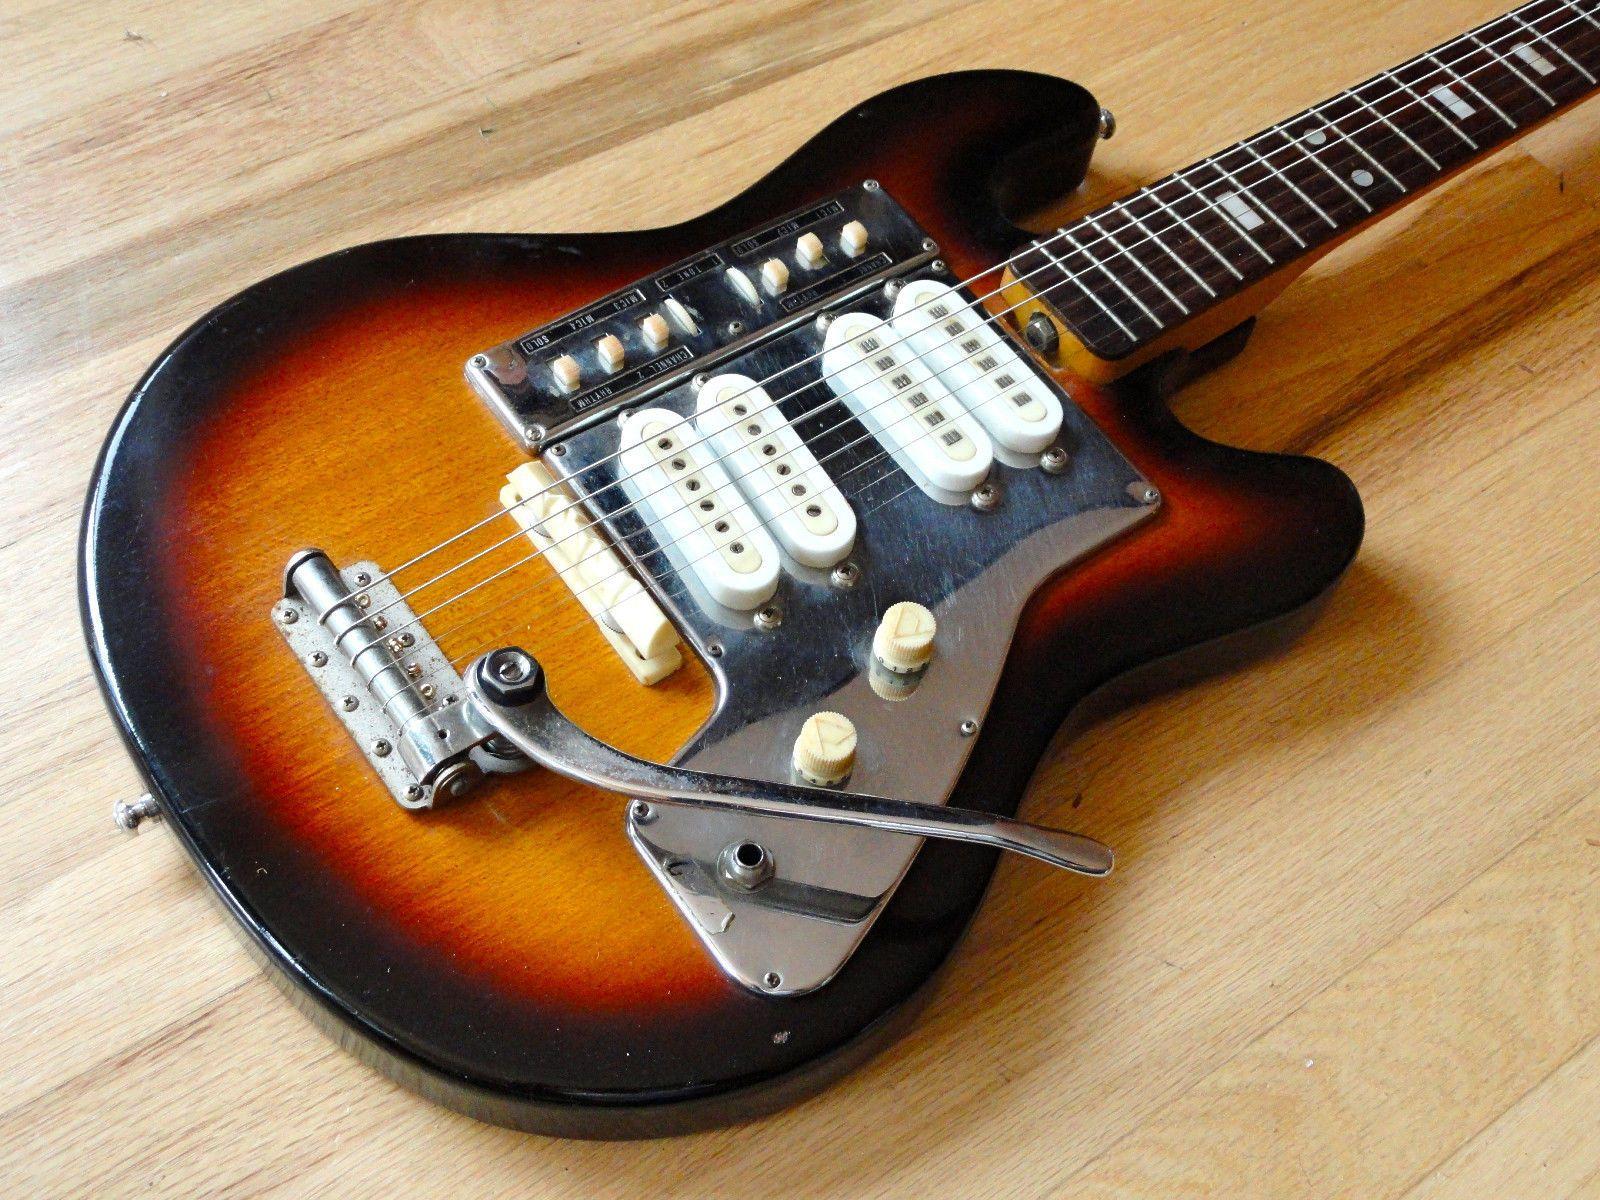 1960s guyatone lg 140t vintage electric guitar japan sunburst vintage classic 60s 70s exotic. Black Bedroom Furniture Sets. Home Design Ideas